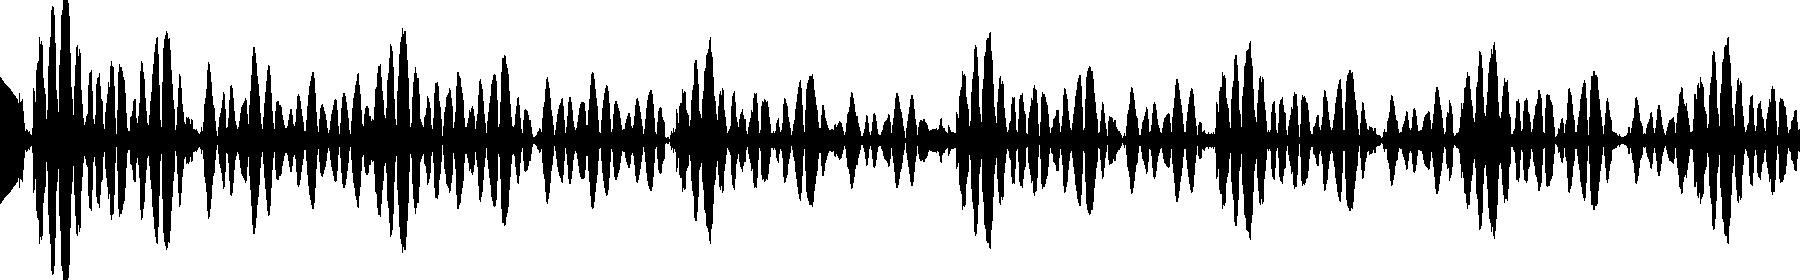 biab glitchhop blip 11